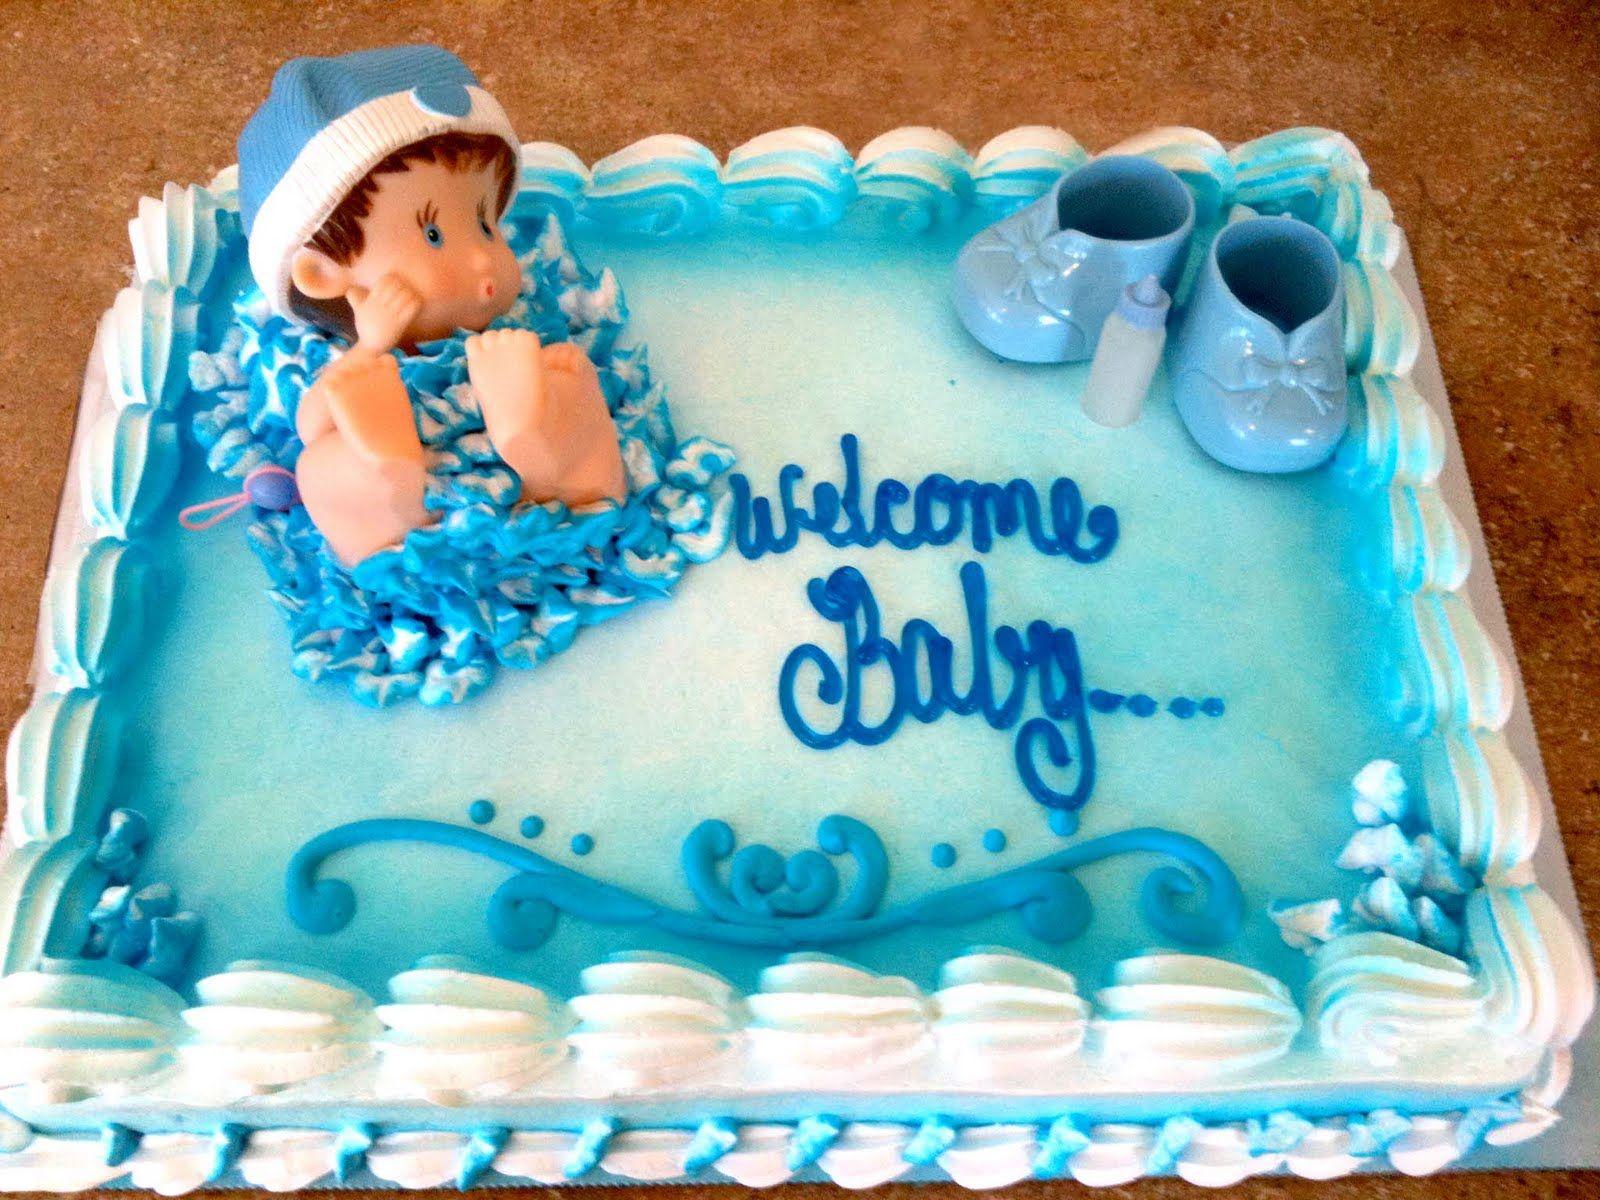 Baby Shower Sheet Cakes | Hectors Custom Cakes: Boy Baby Shower ...